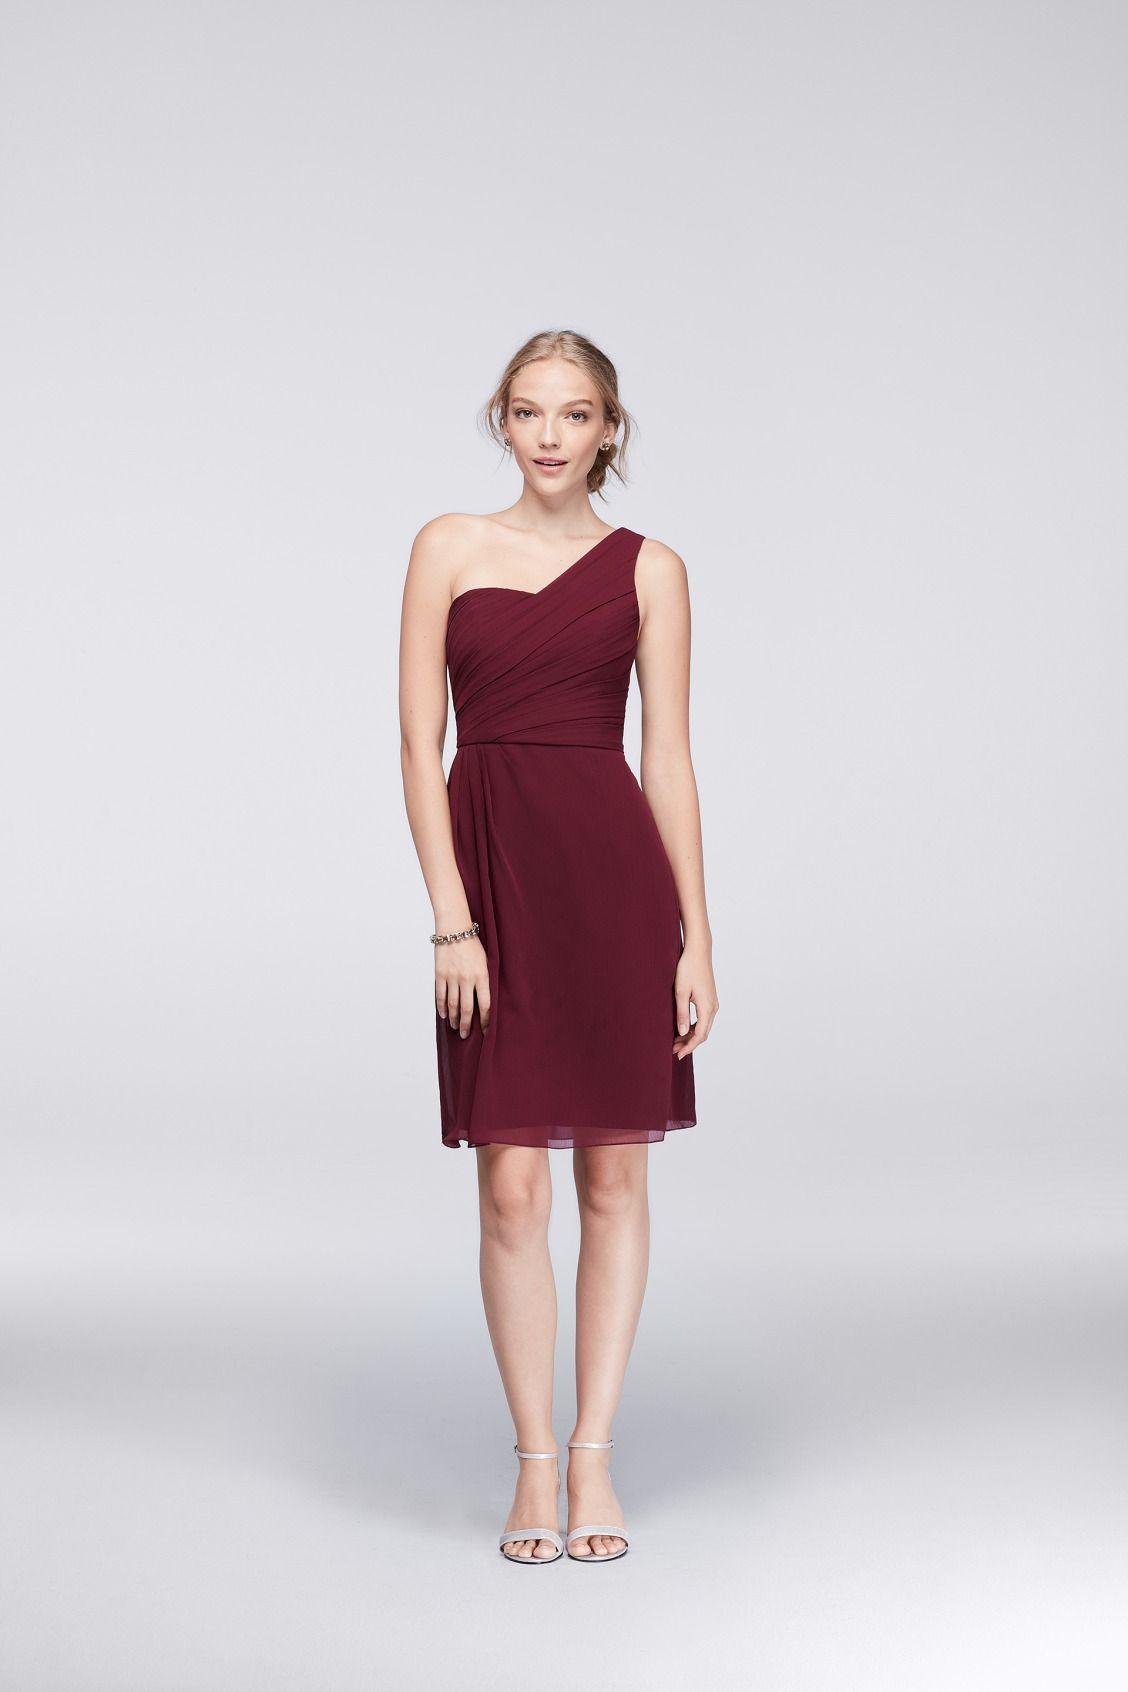 A short one shoulder burgundy bridesmaid dress from davids bridal a short one shoulder burgundy bridesmaid dress from davids bridal ombrellifo Images